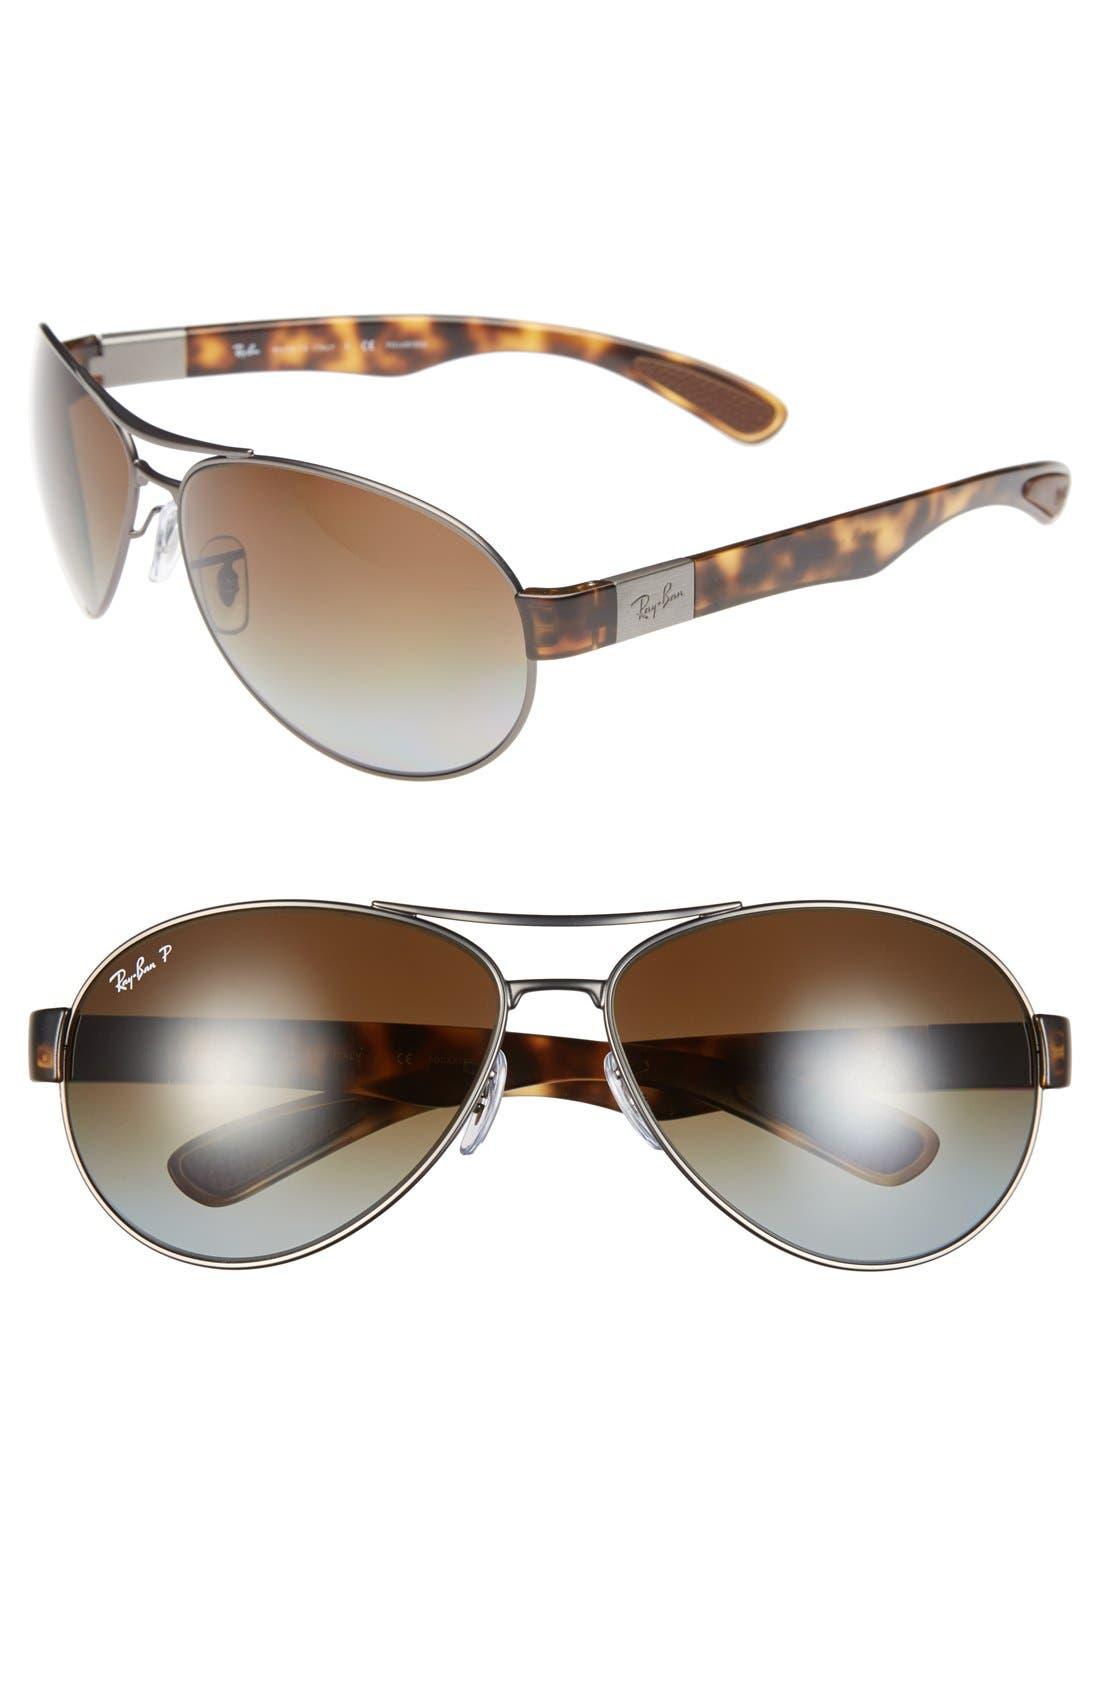 Ray-Ban 6m Aviator Sunglasses - Gunmetal/ Brown Gradient